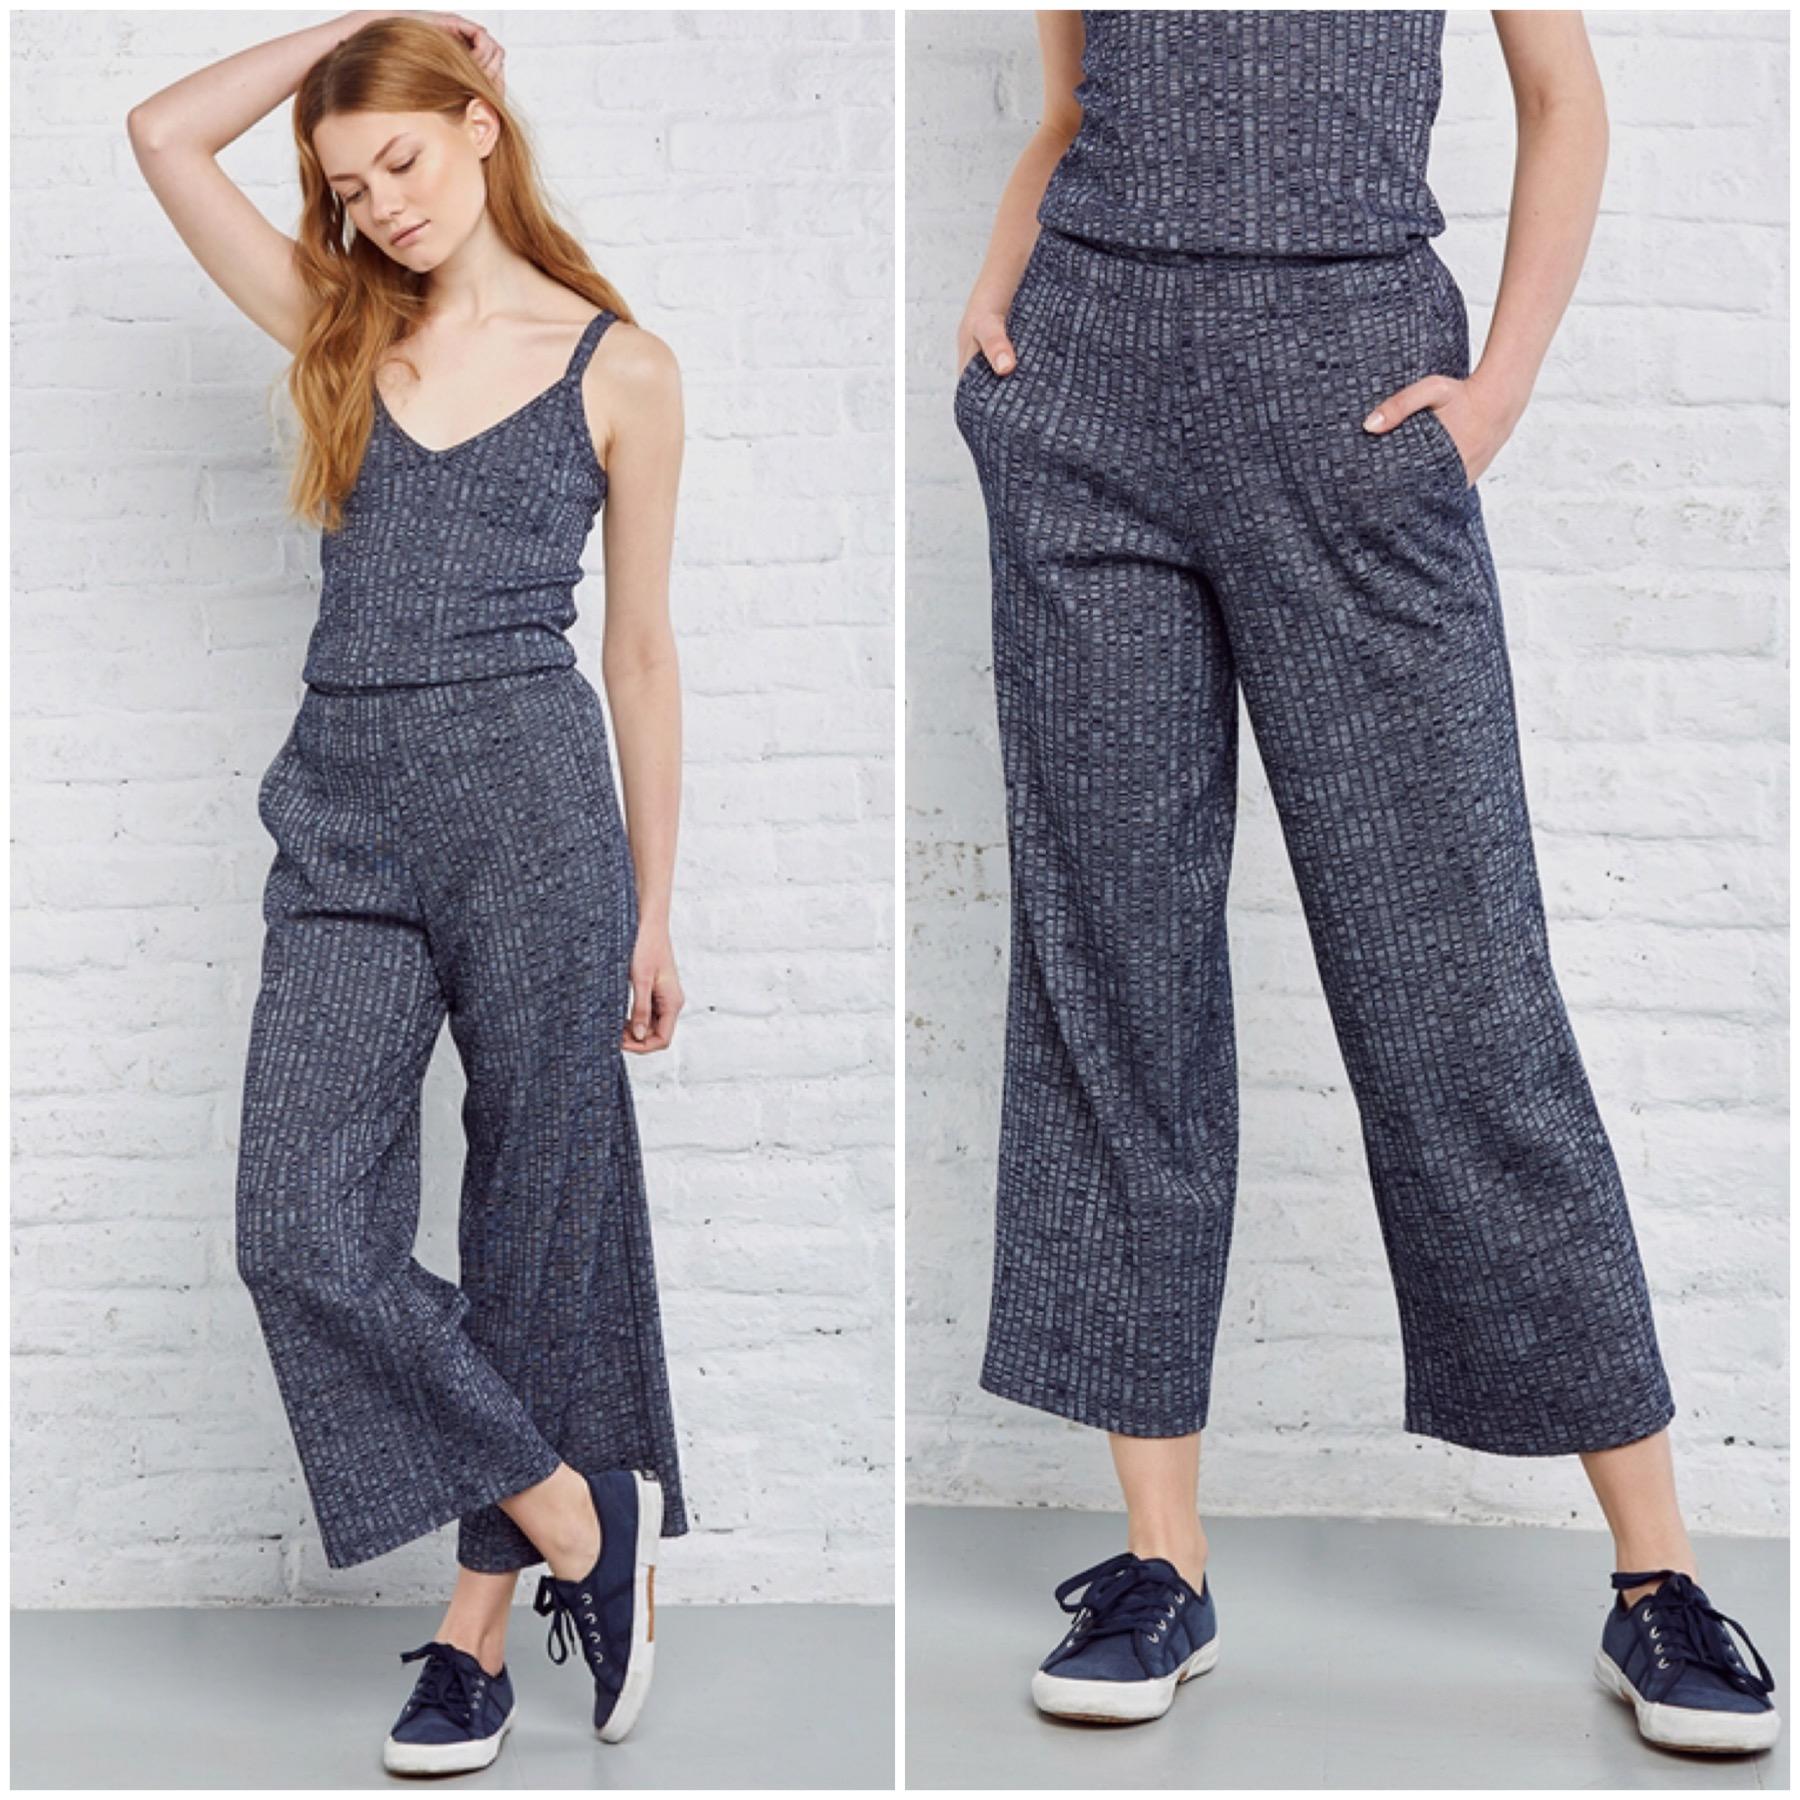 Amichi pantalones culottes